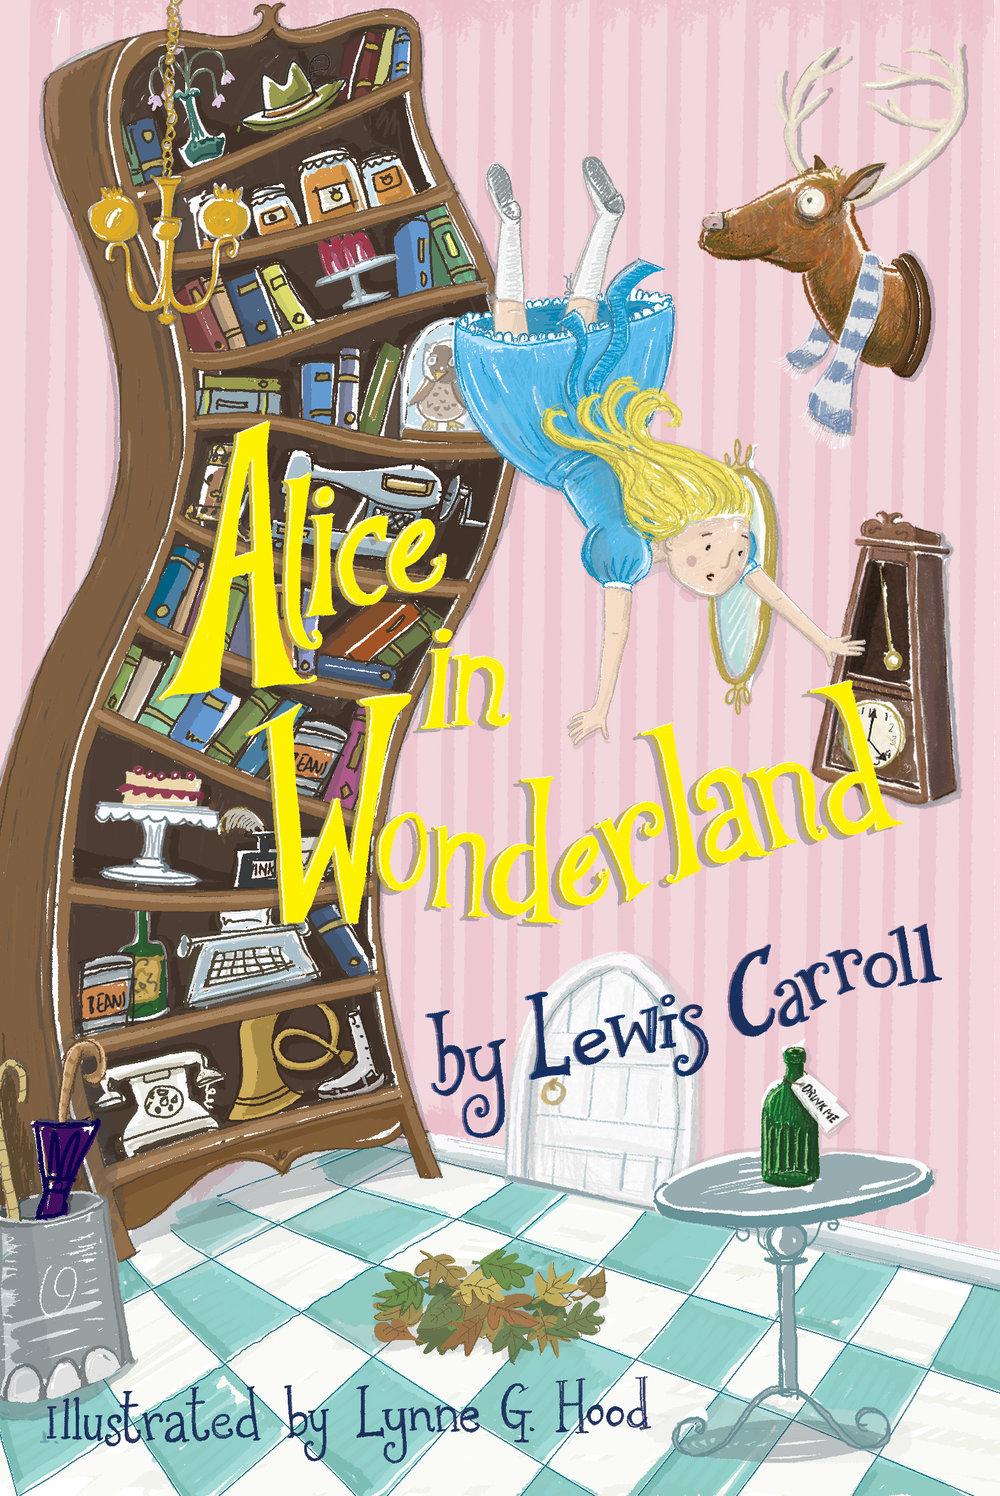 Alice in Wonderland cover design